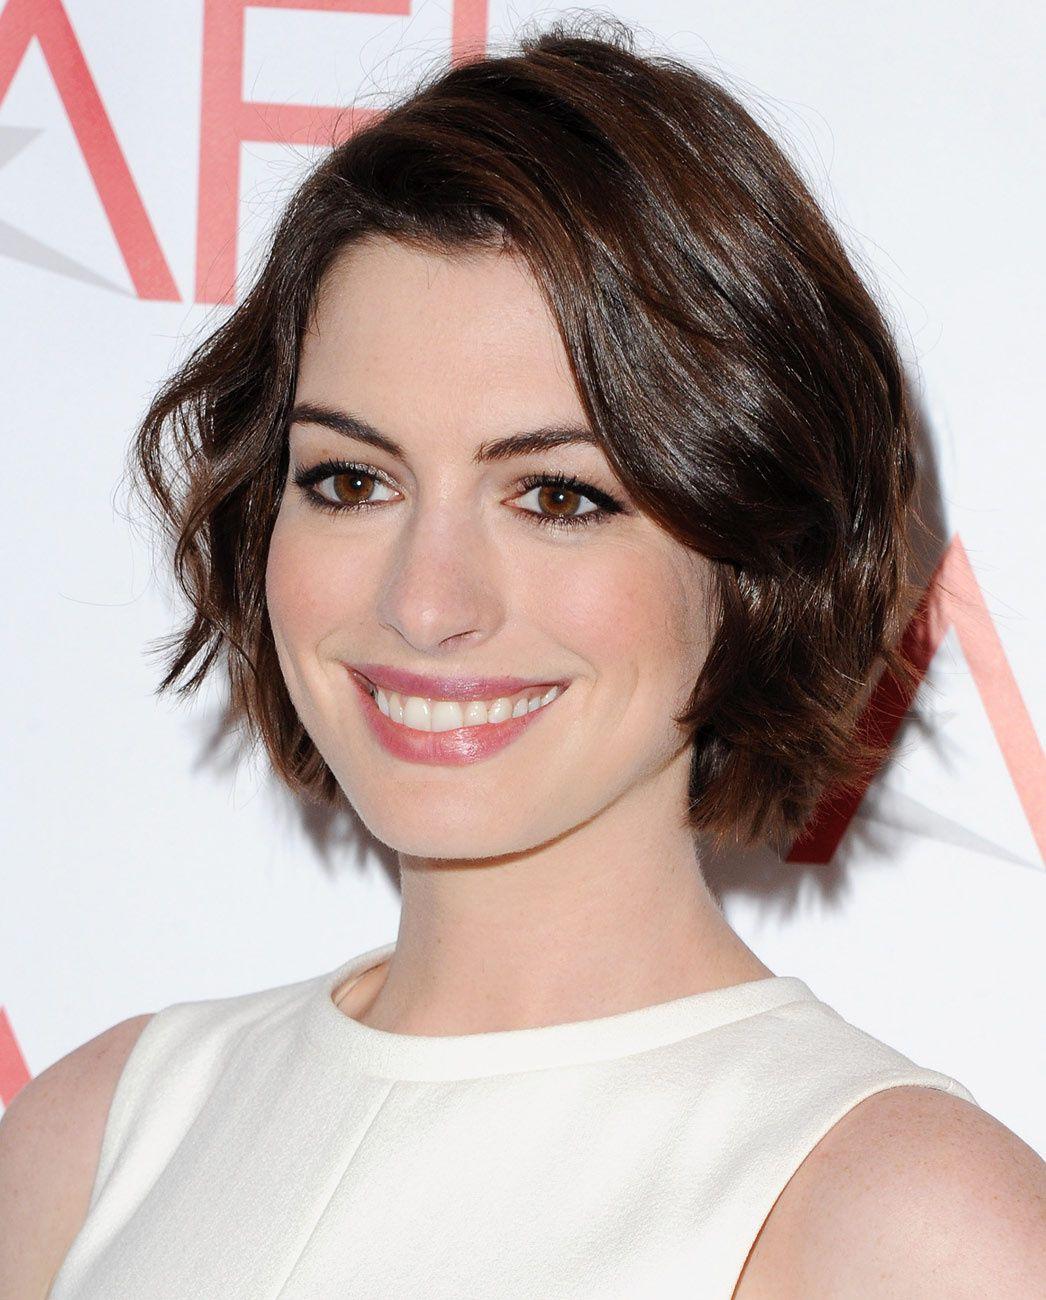 Anne Hathaway Short Hair: Anne Hathaway Y La Naturalidad Del Bob